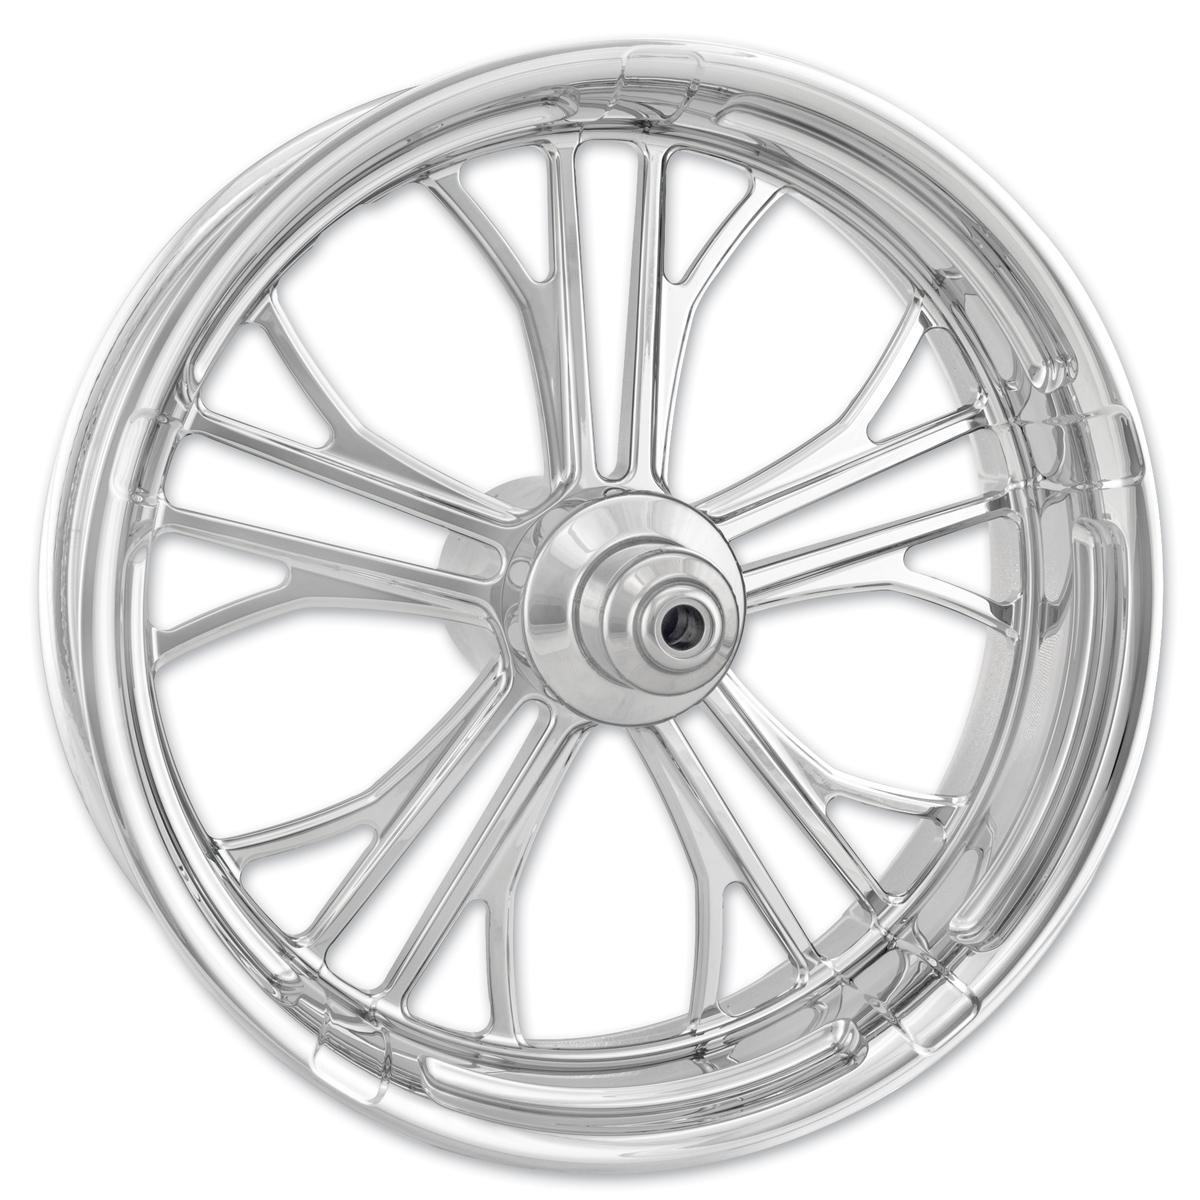 Performance Machine Dixon Chrome Rear Wheel, 17